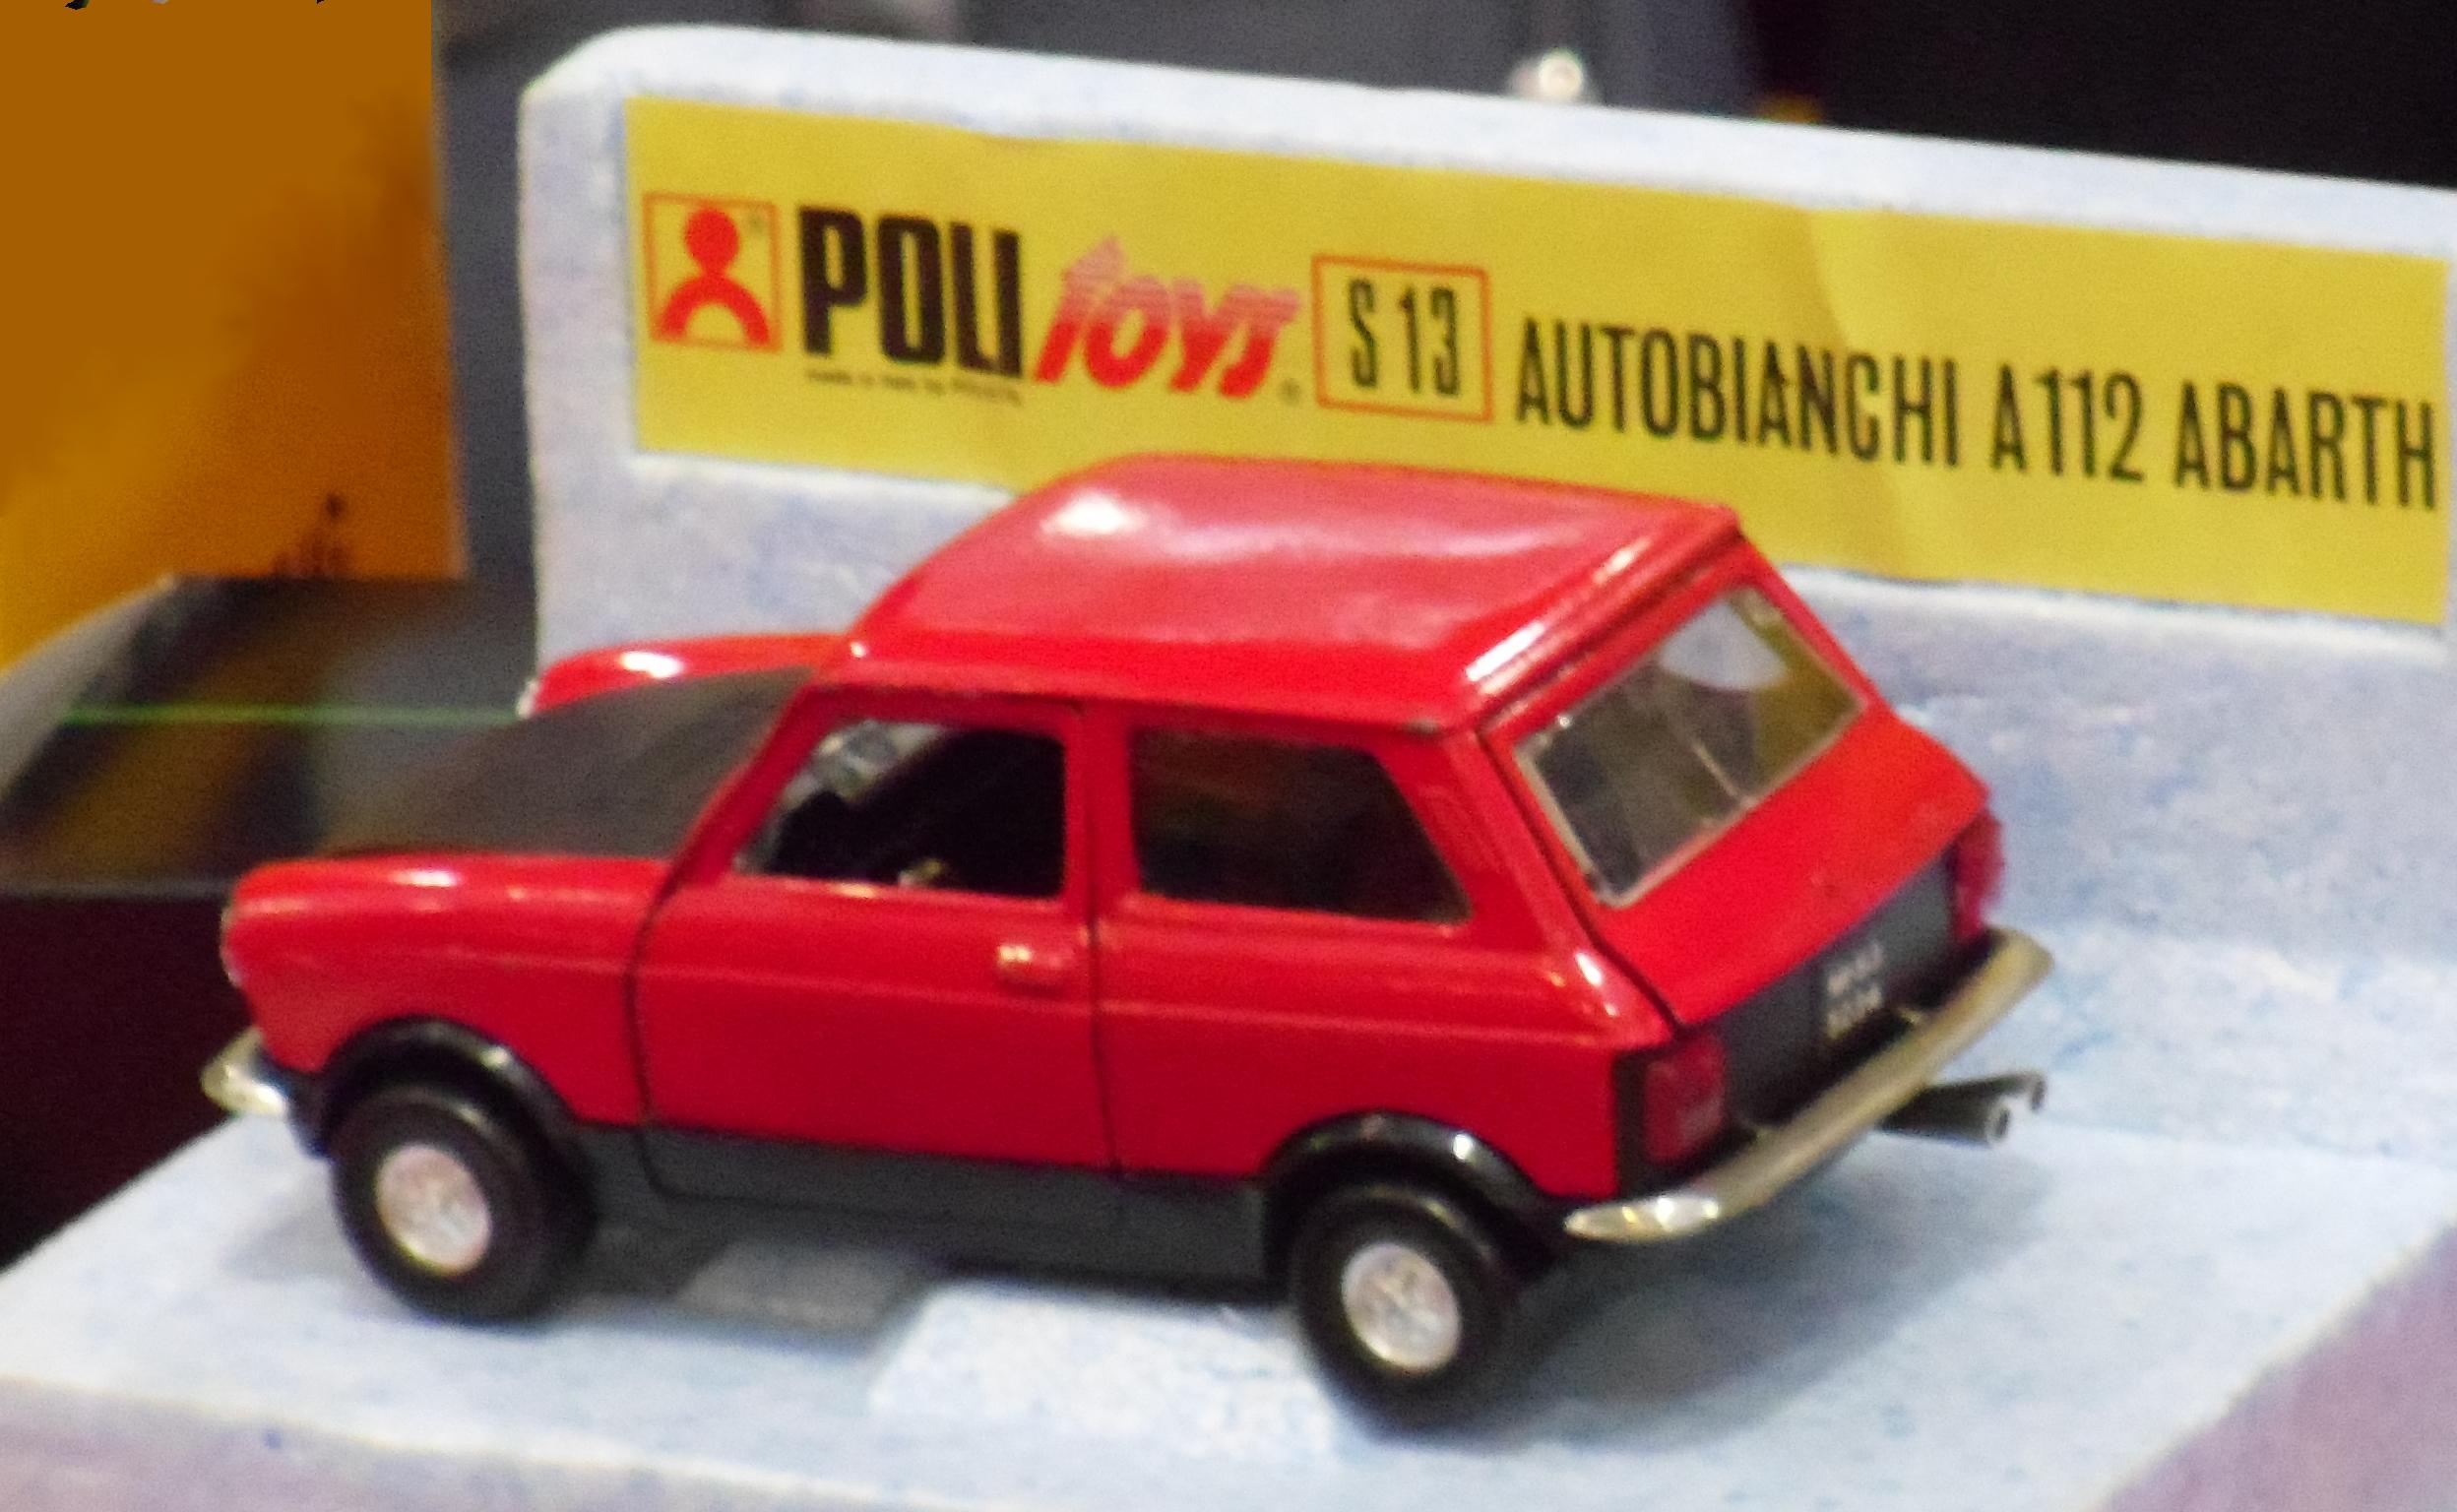 S13, Autobianchi A112 Abarth